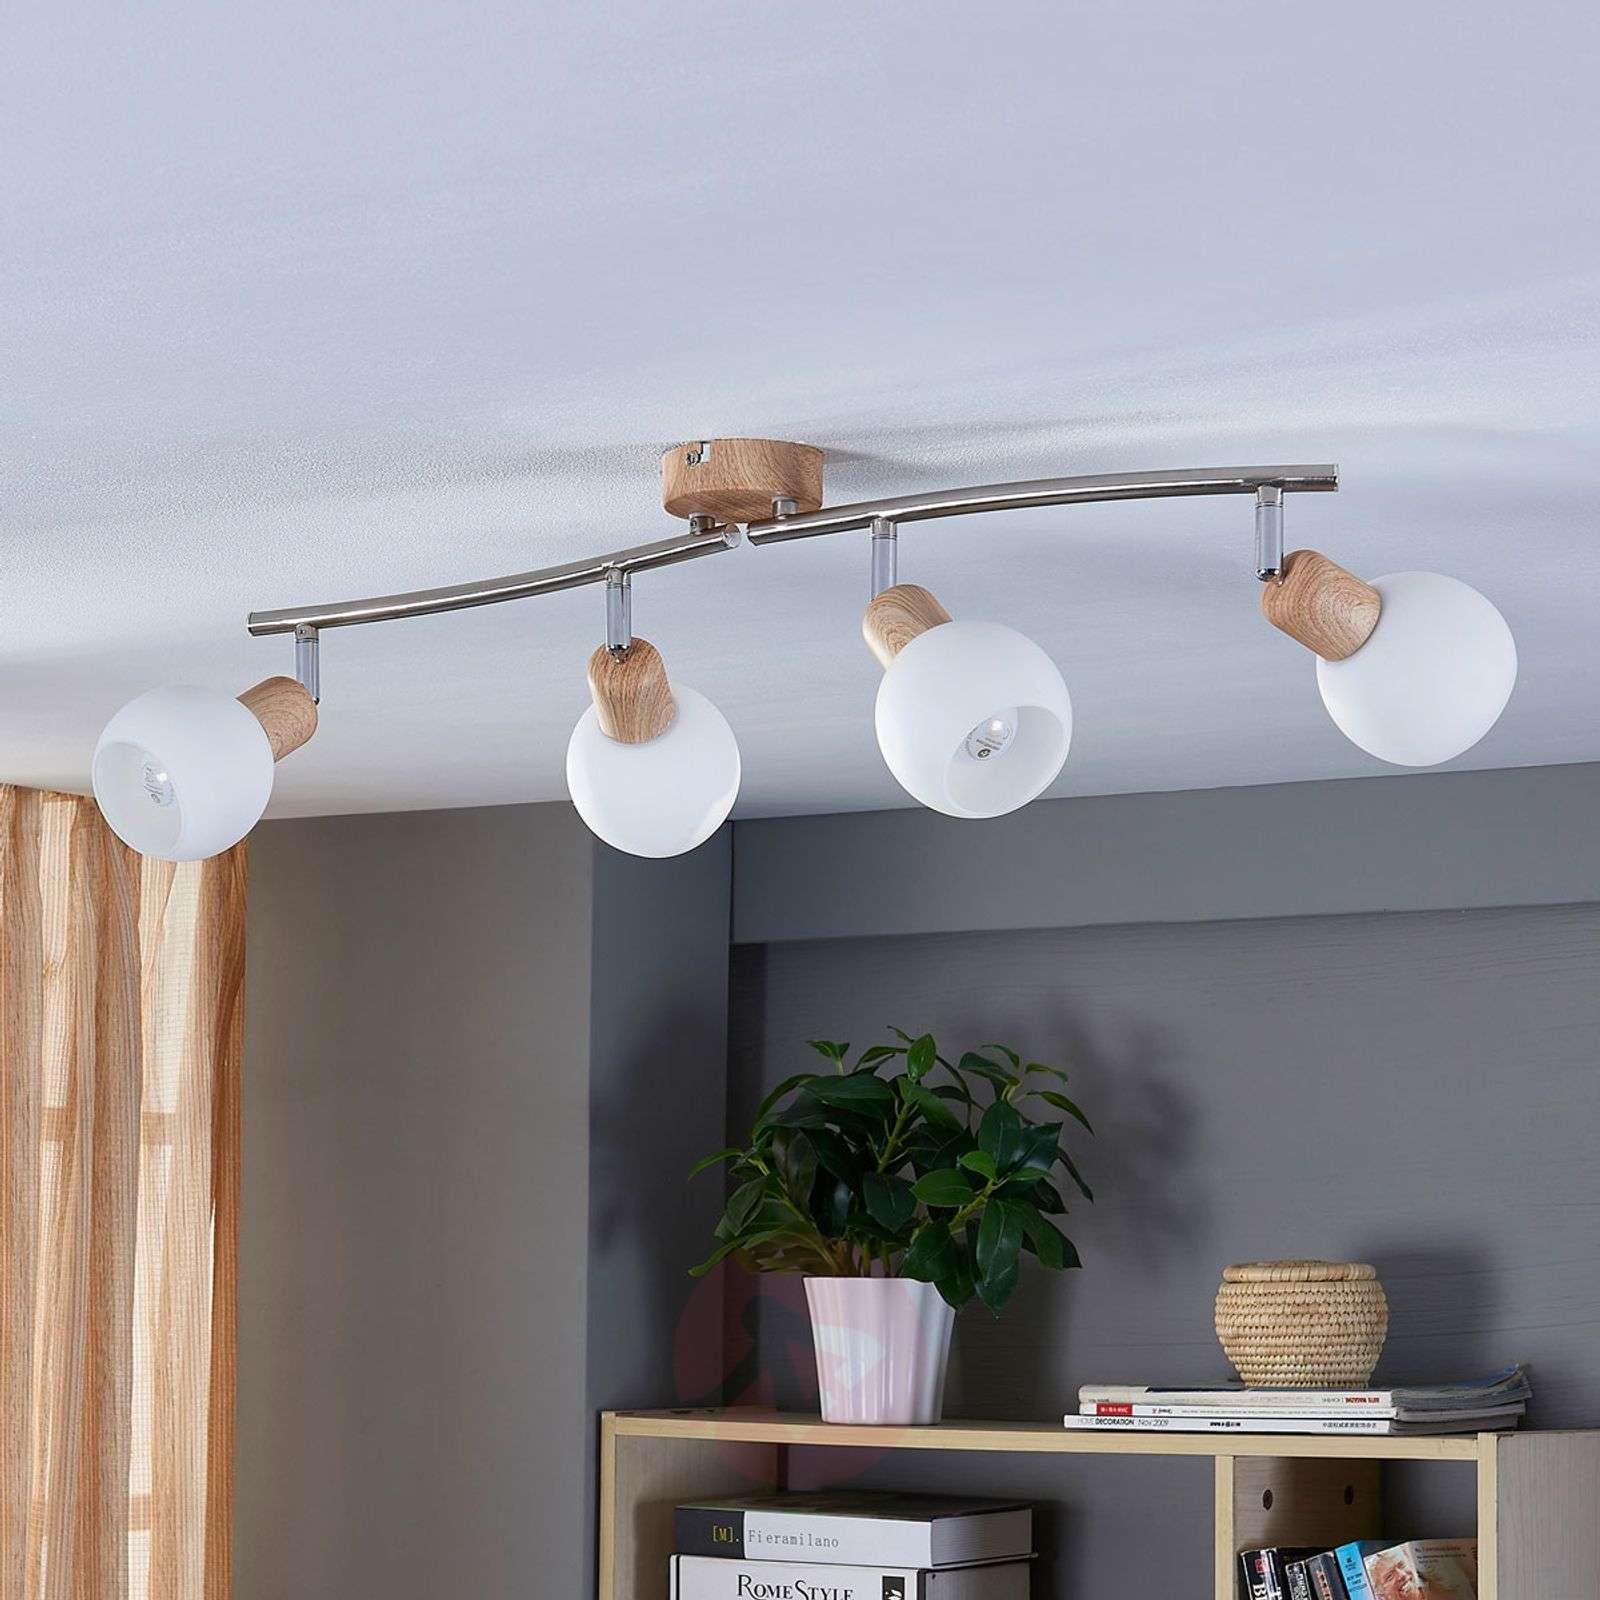 4-lamppuinen LED-kohdevalo Svenka, puupinta-9621050-02